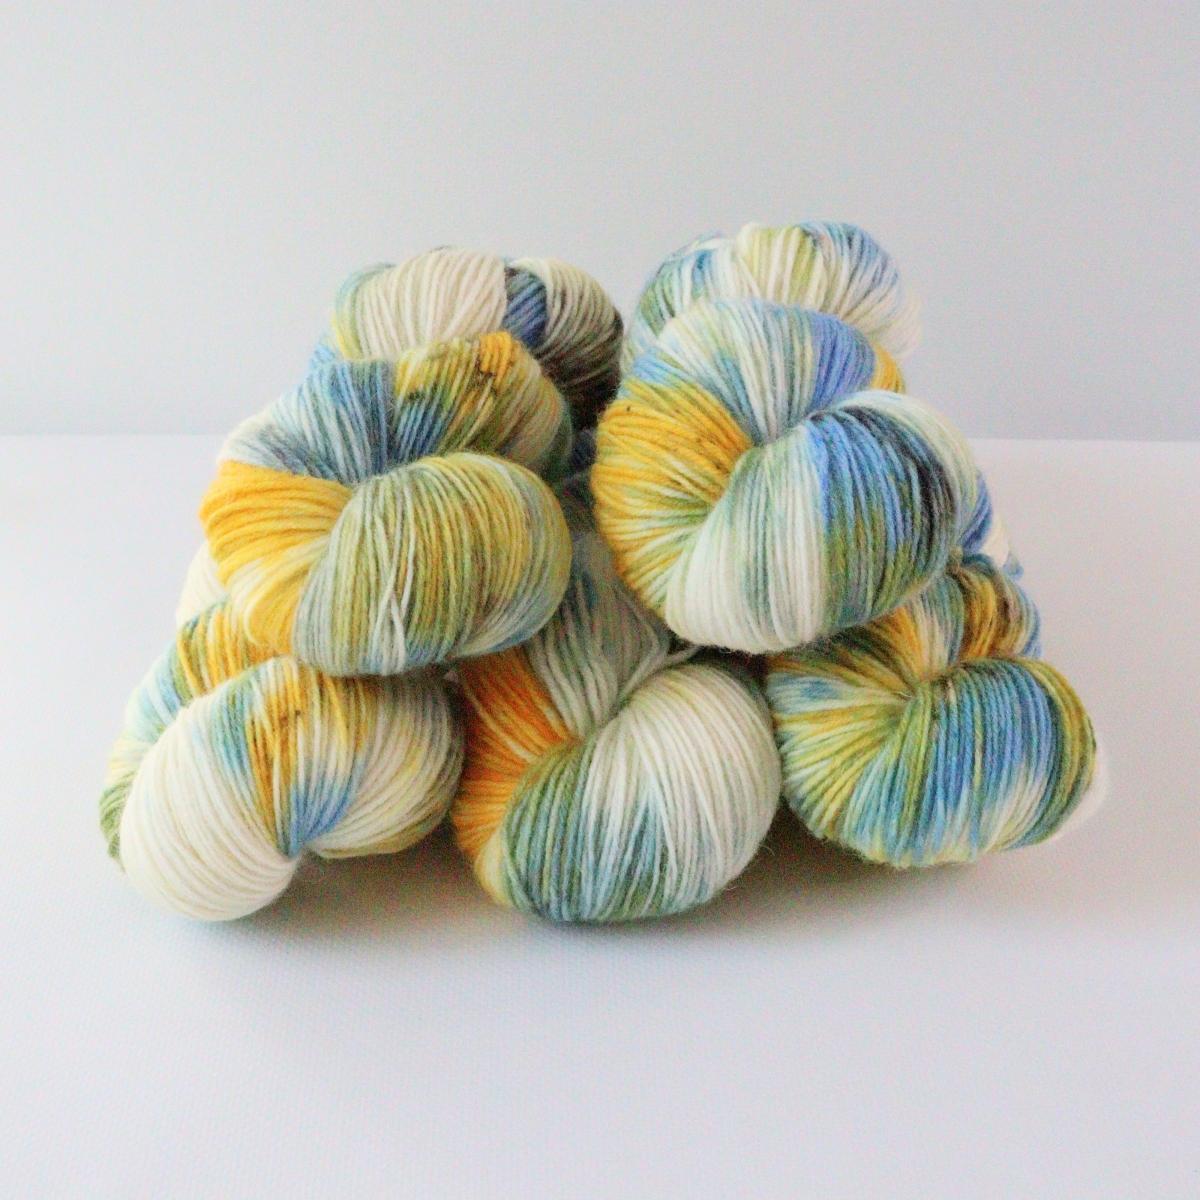 woodico.pro hand dyed yarn 087 1200x1200 - Hand dyed yarn / 087